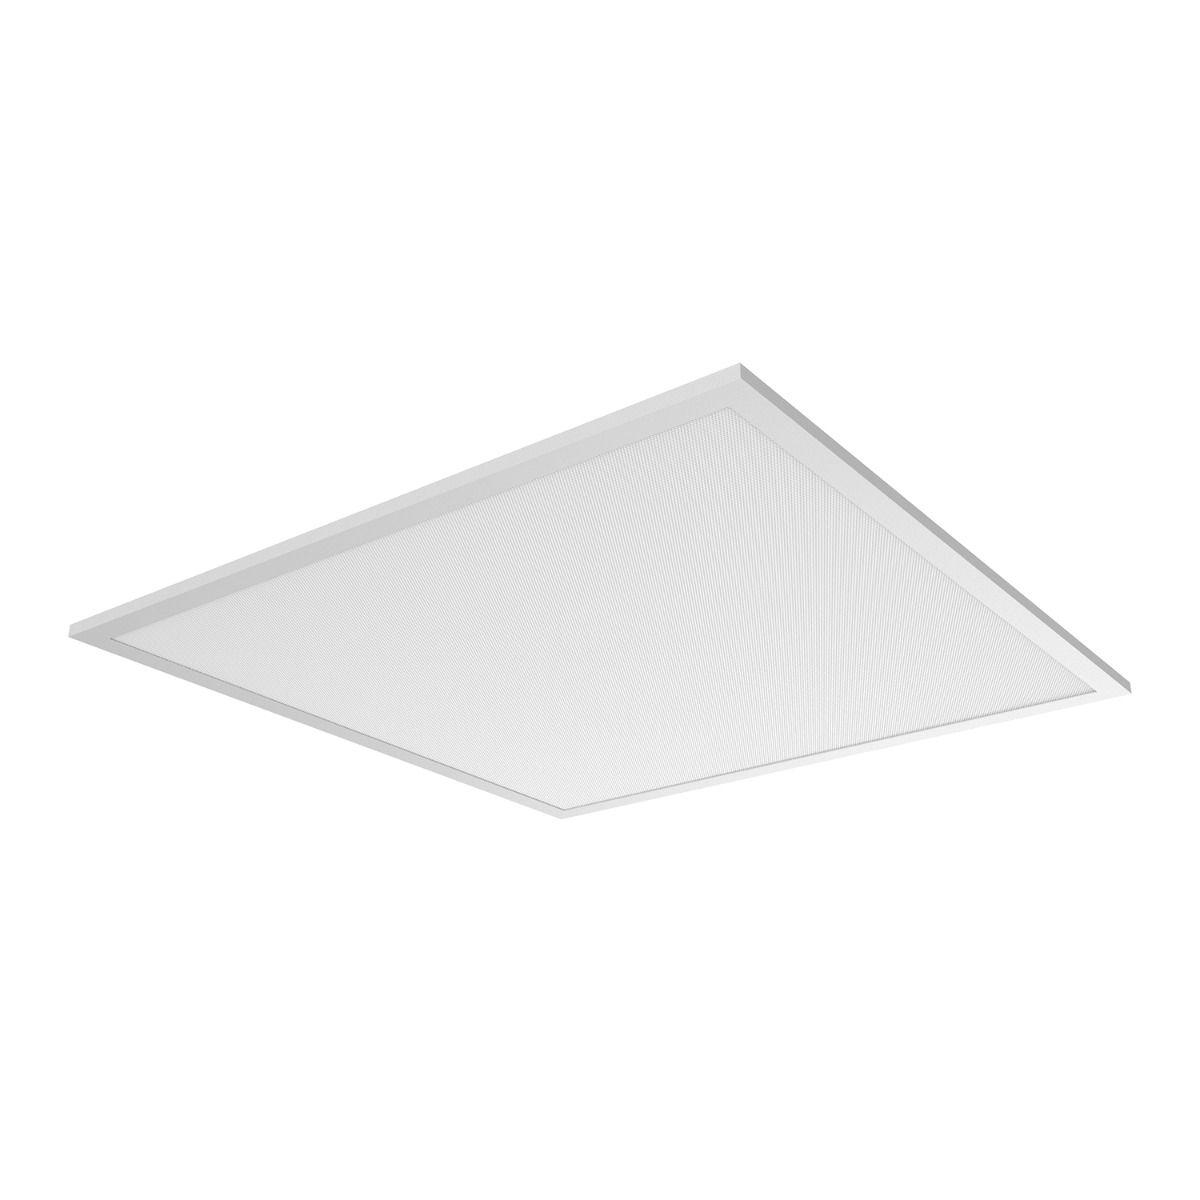 Noxion Panel LED Delta Pro V3 Highlum 36W 4000K 5500lm 60x60cm UGR <19 | Blanco Frio - Reemplazo 4x18W